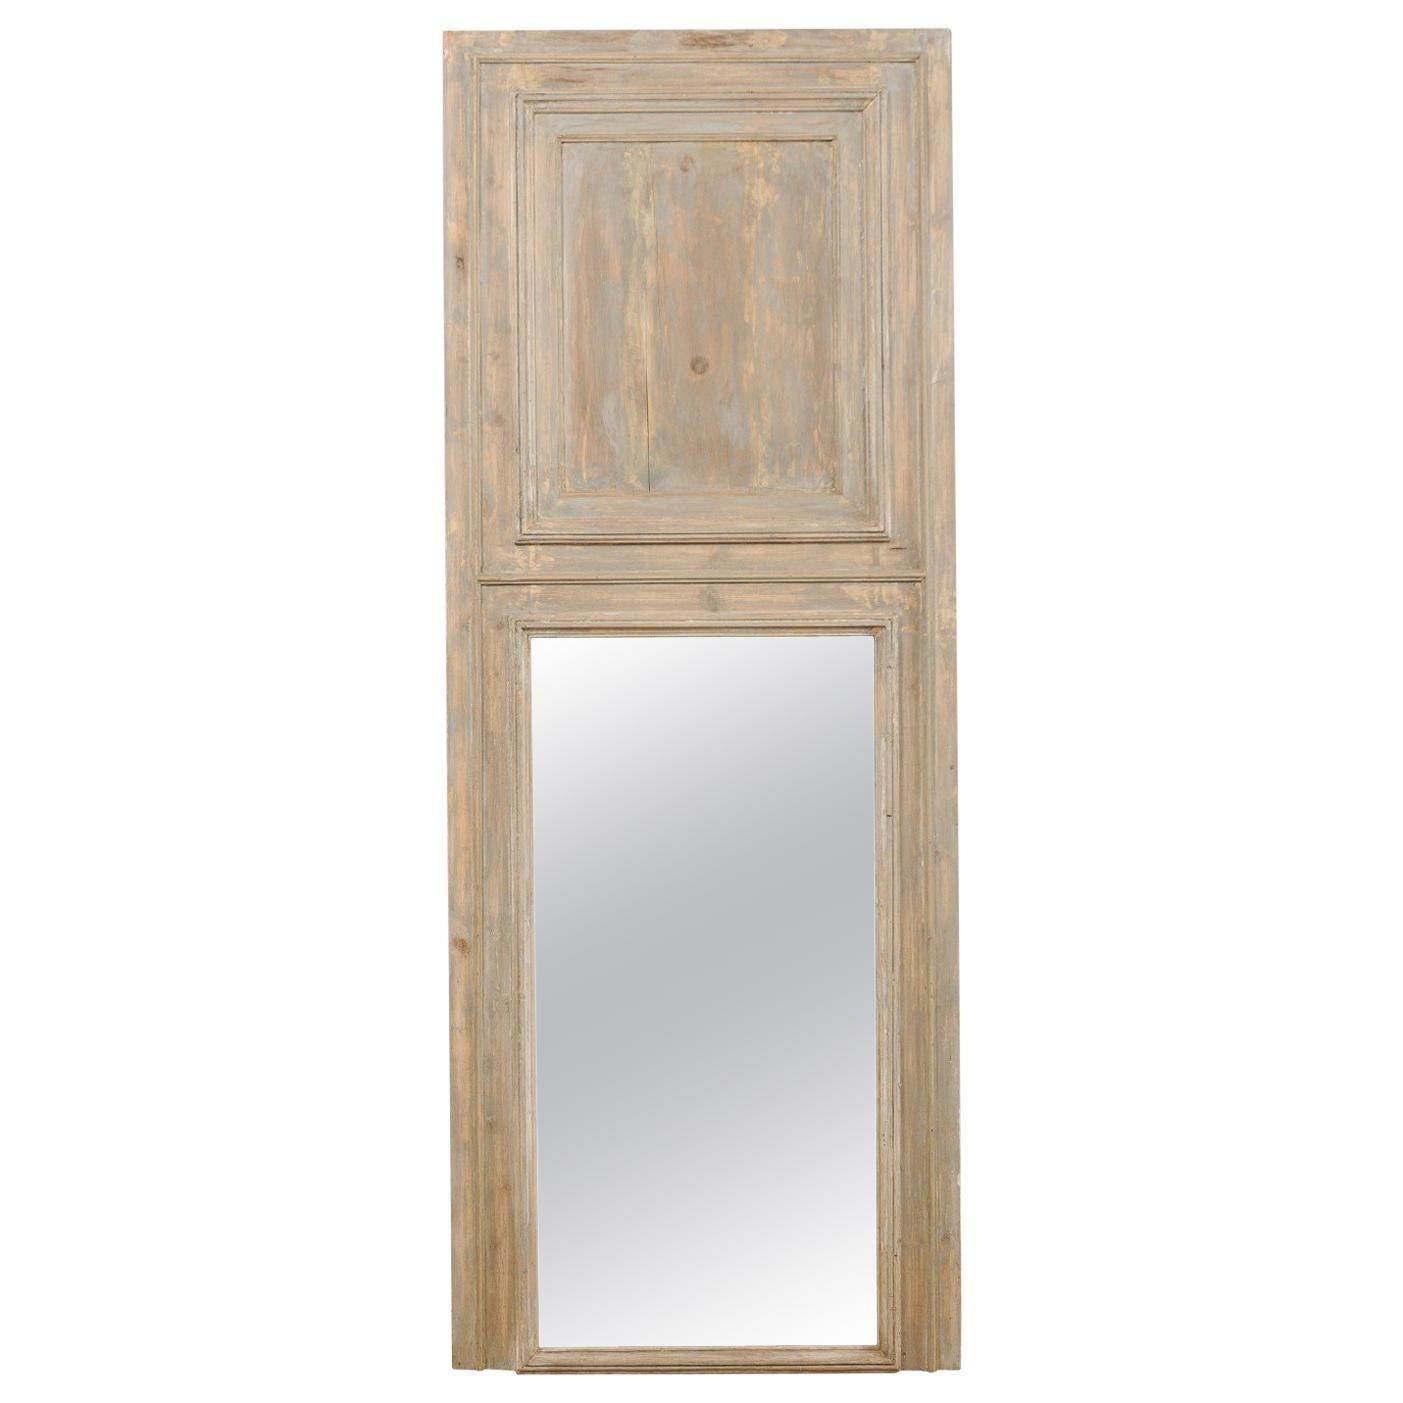 French 19th Century Trumeau Mirror